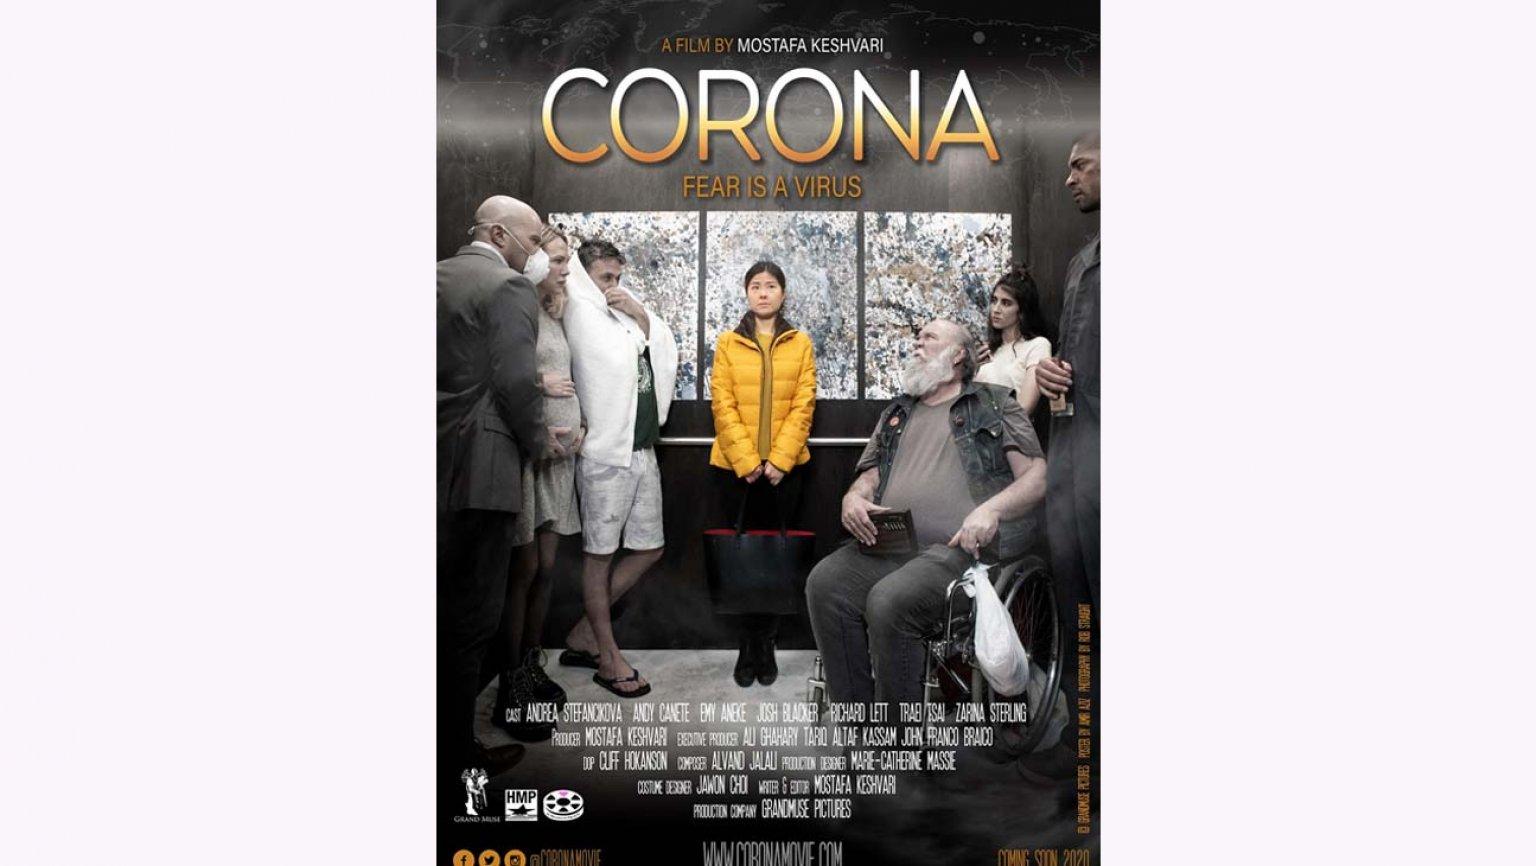 COVID-19 movie